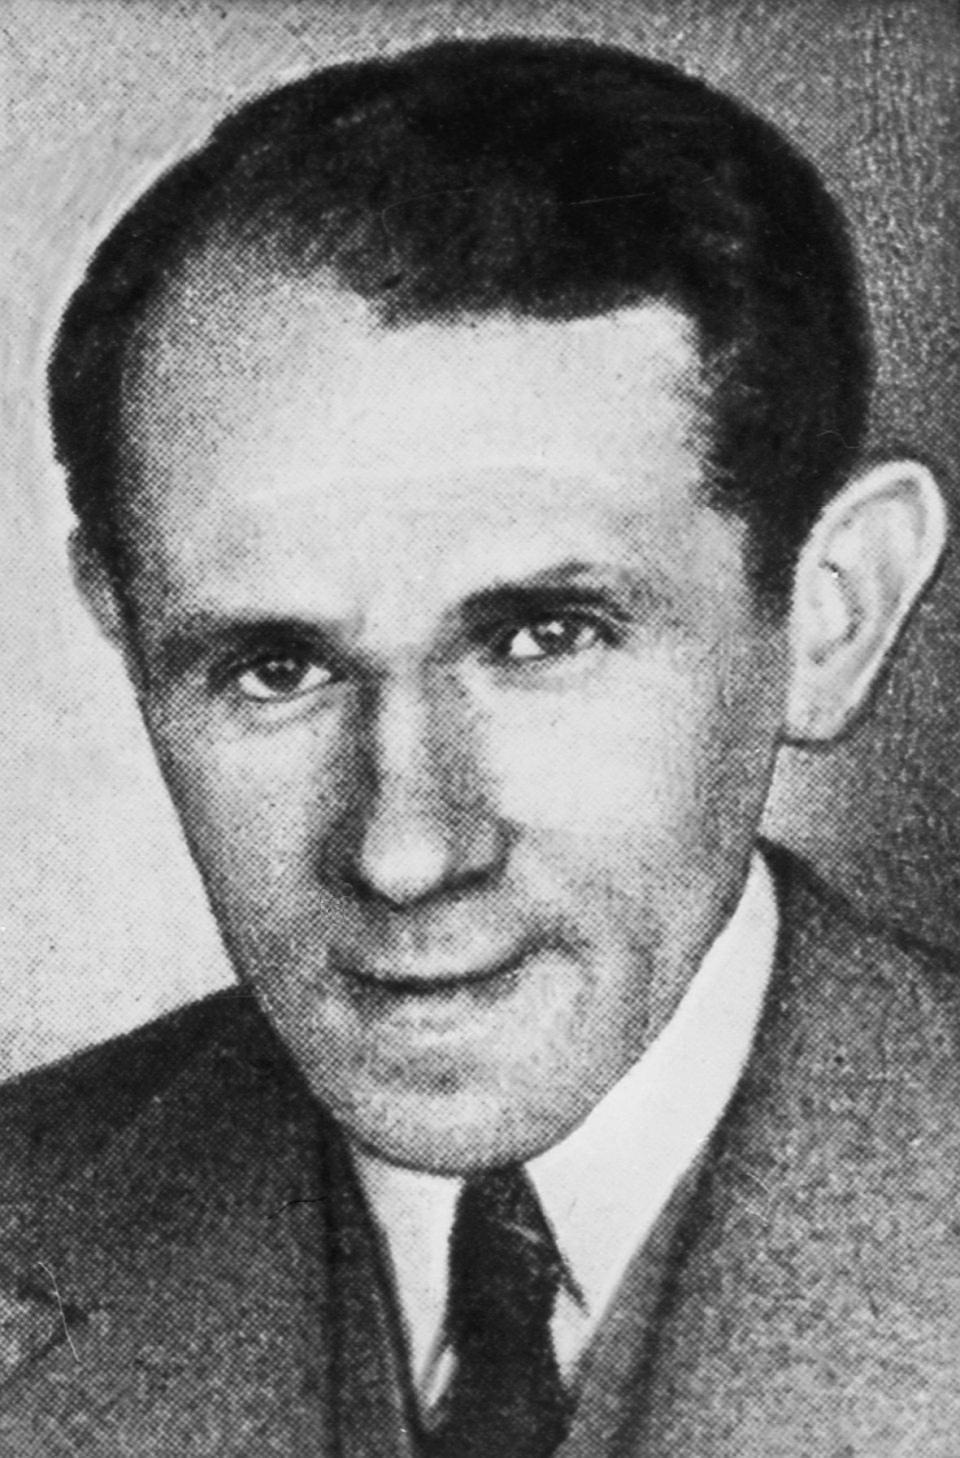 Бруно Шульц, 1930-ті рр. 1